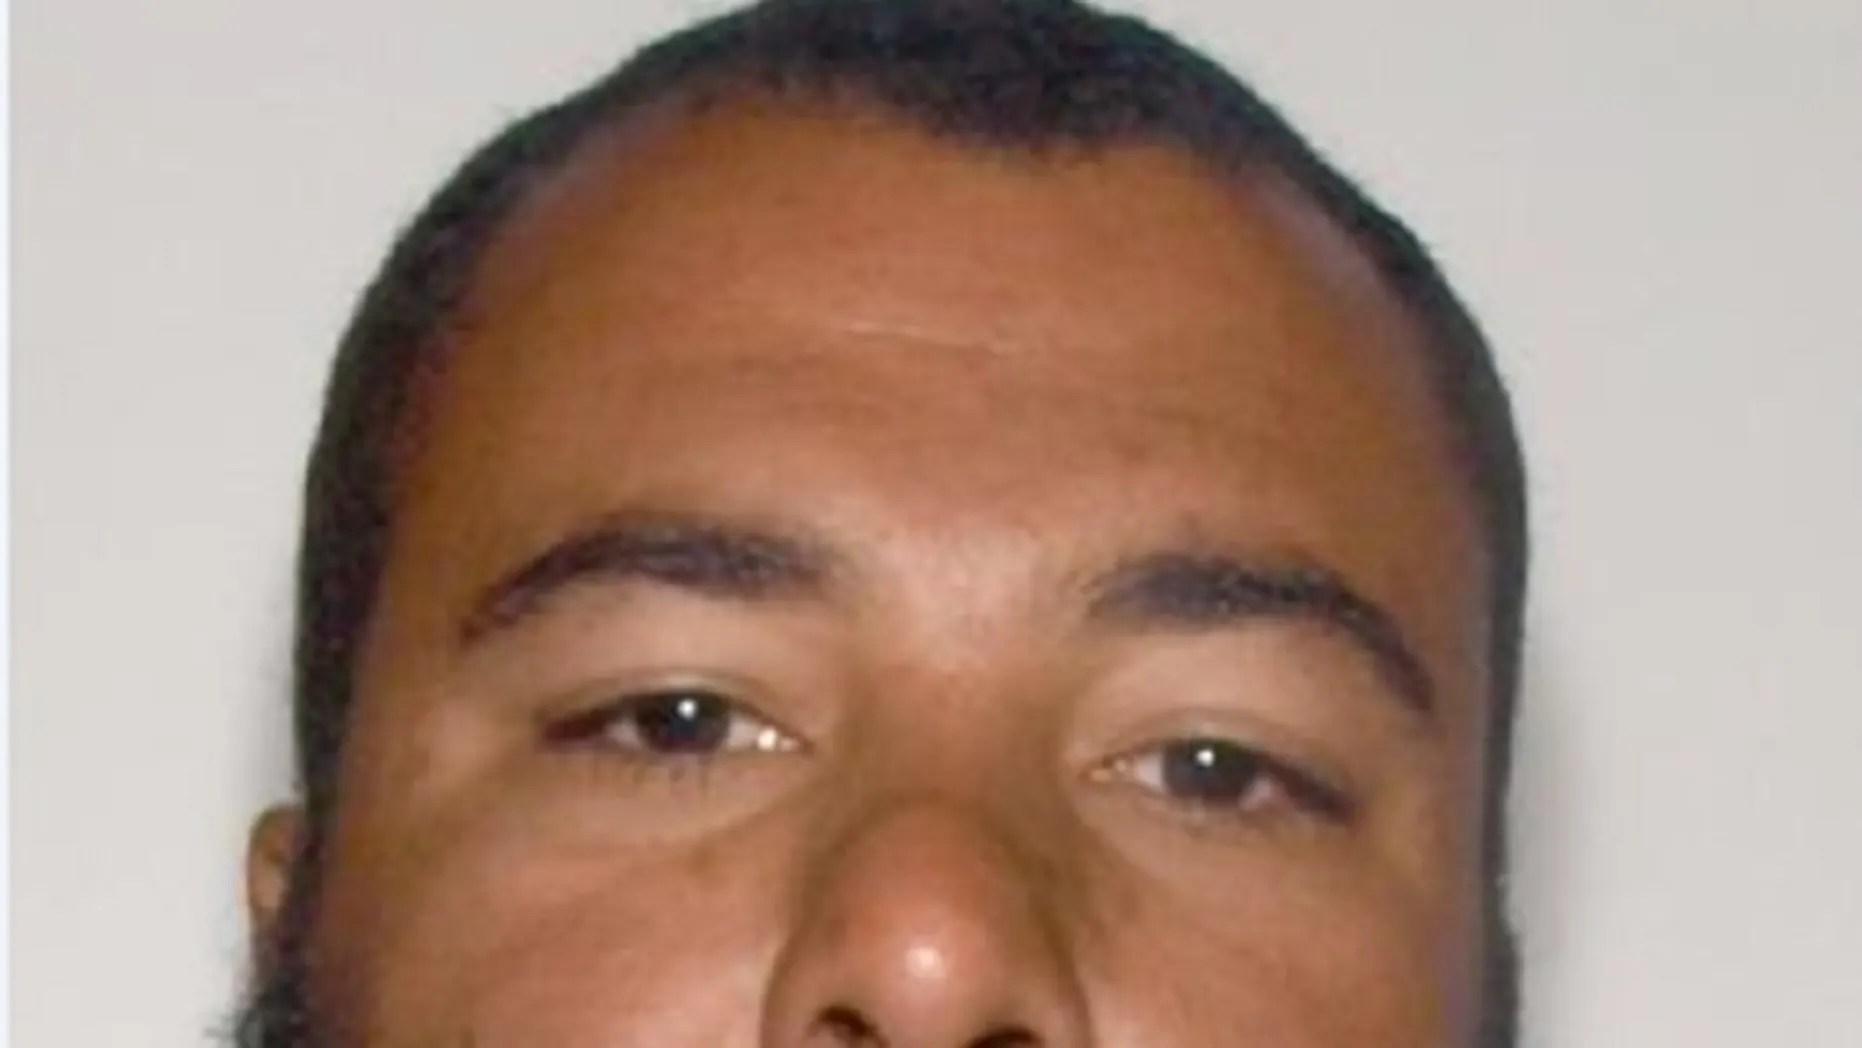 Jerome Daniel Colvin, 34, is accused of murdering Allen Craig Willard Jr., 25, on Tuesday.